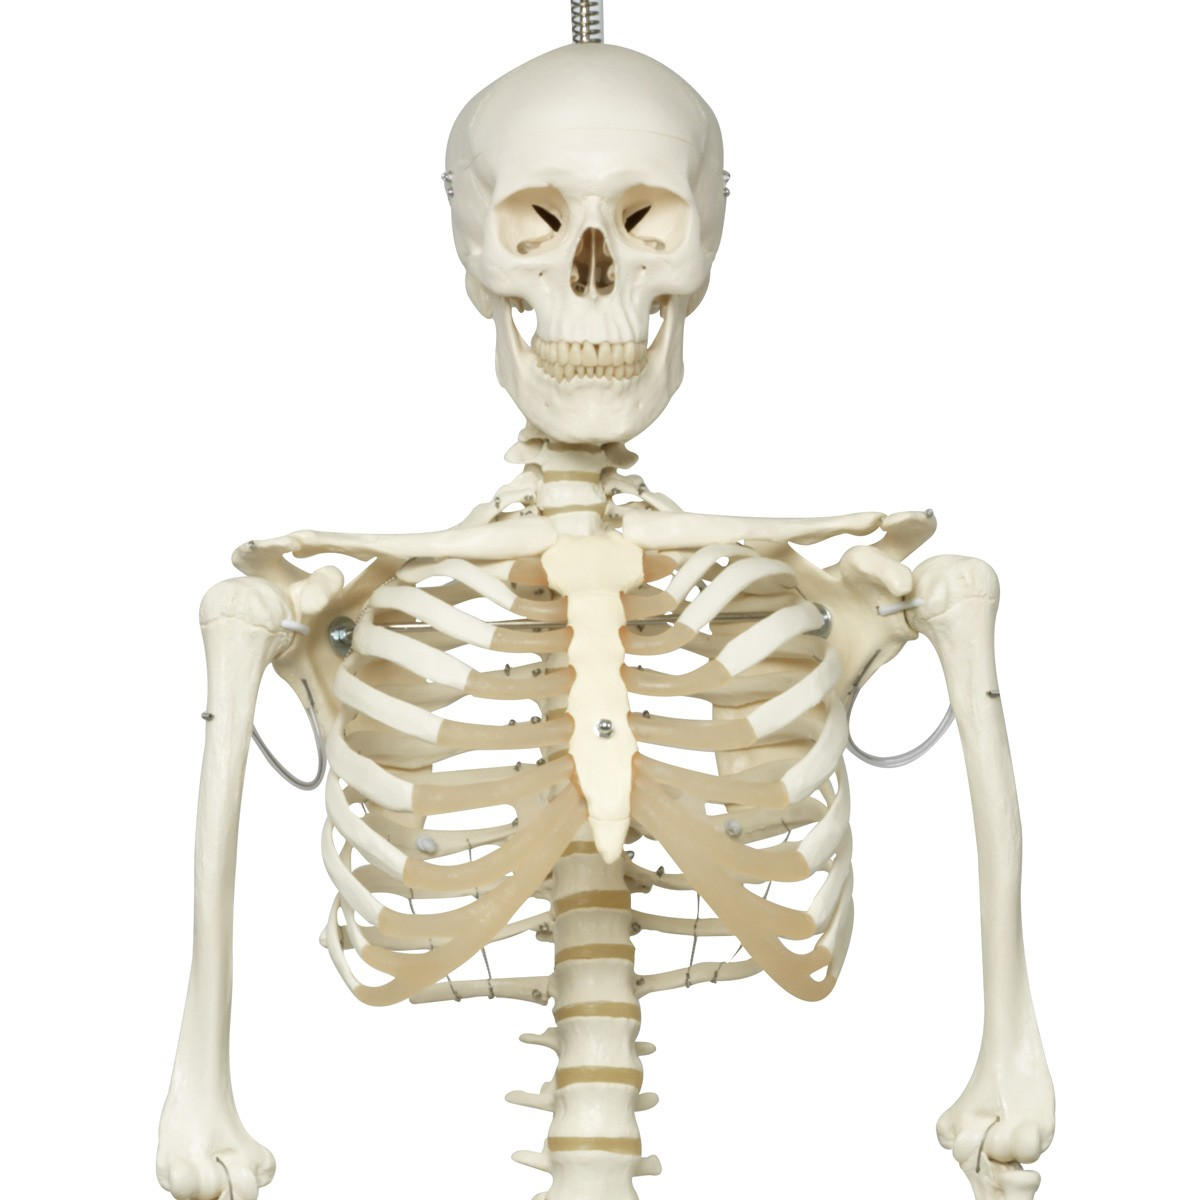 Skelett-Modell Phil, Physiologisches Skelett auf Hängestativ